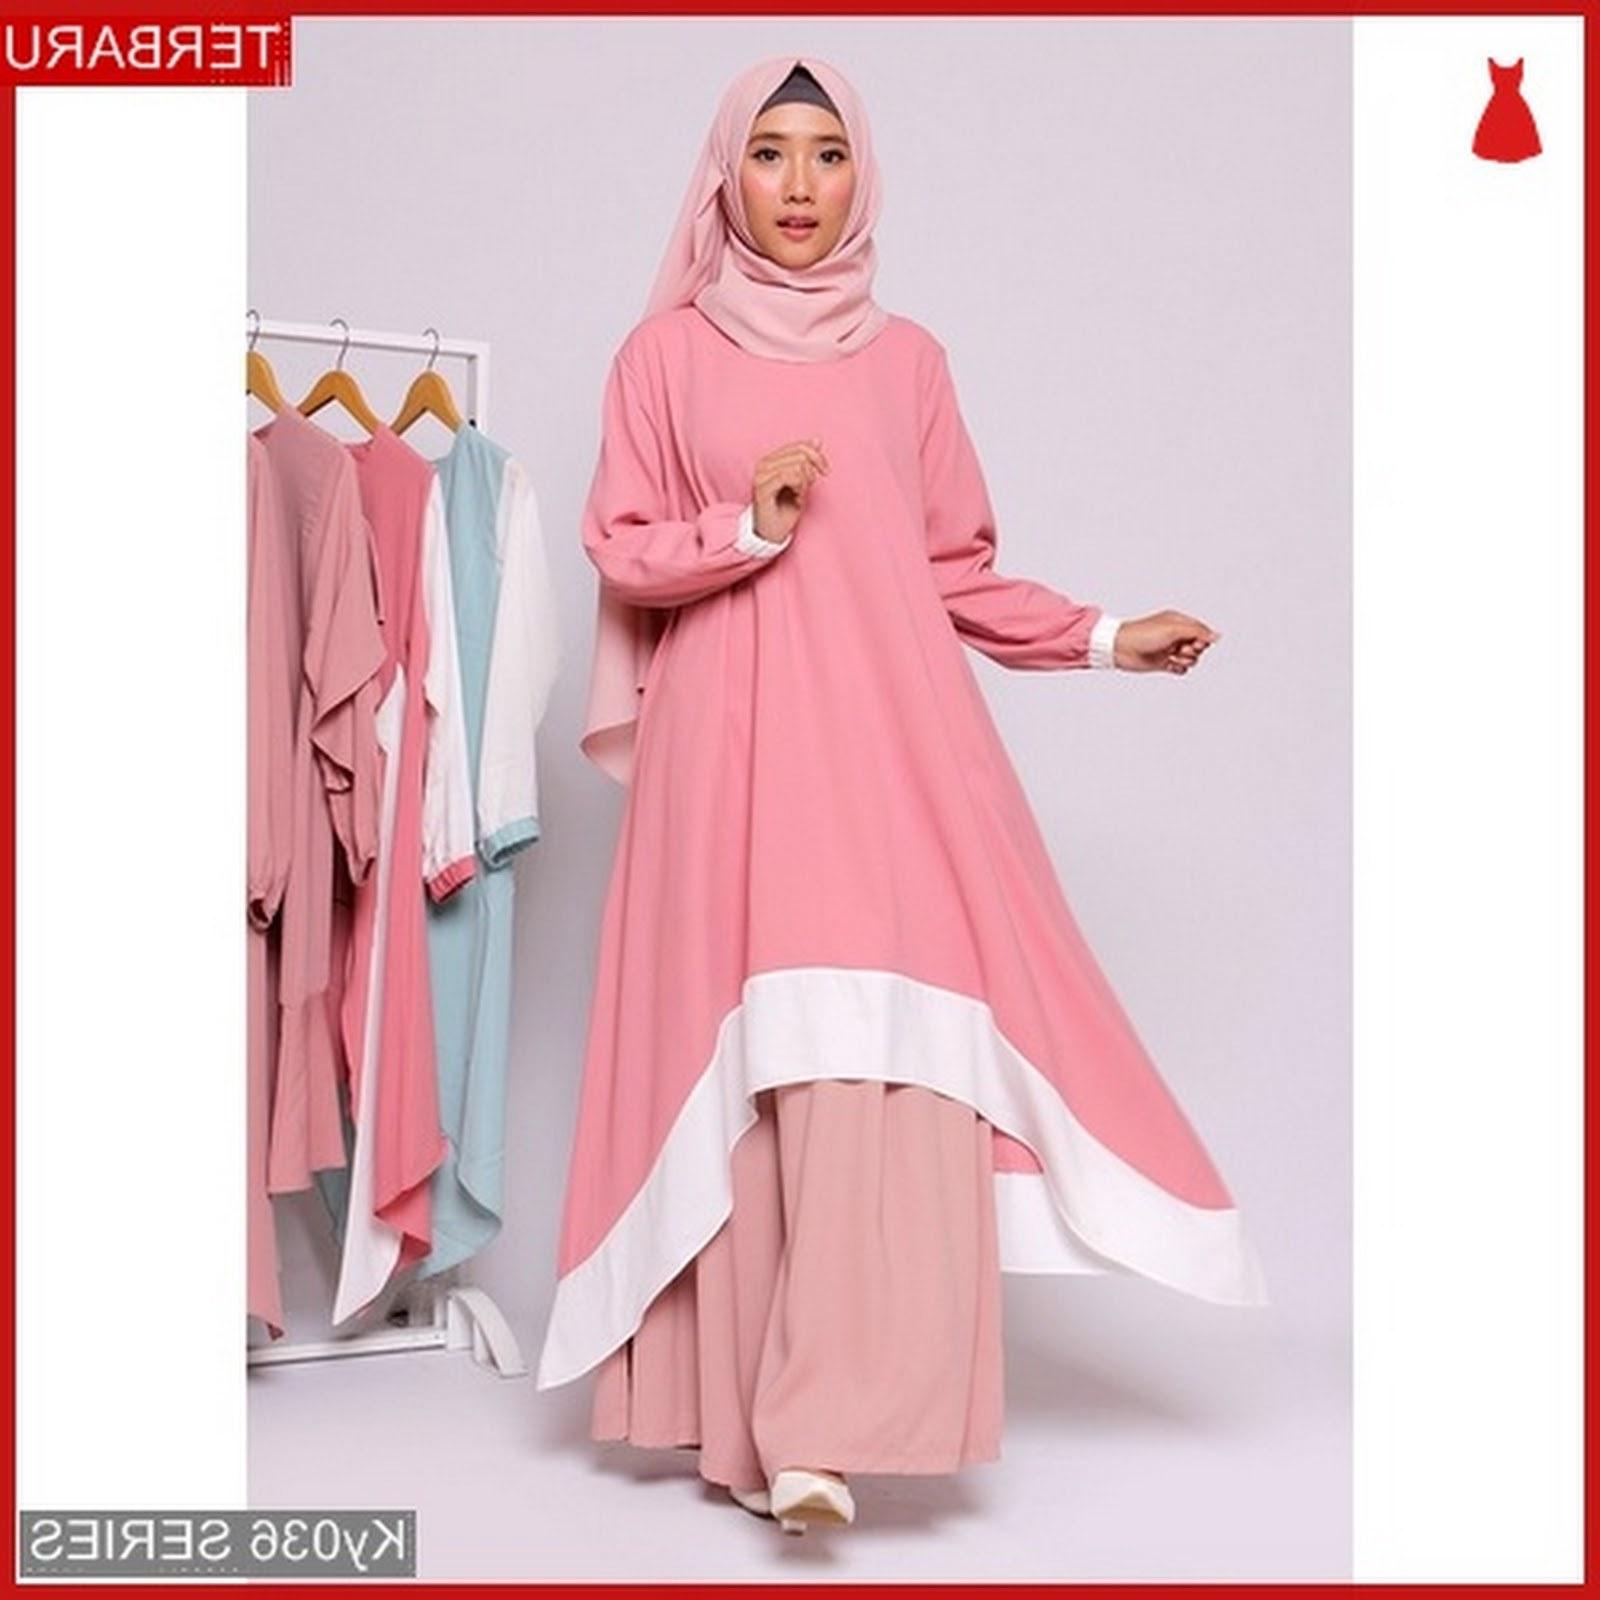 Ide Baju Lebaran Keren Jxdu Dapatkan Baju Muslim Lebaran Paling Keren Terbaru Di Bmg